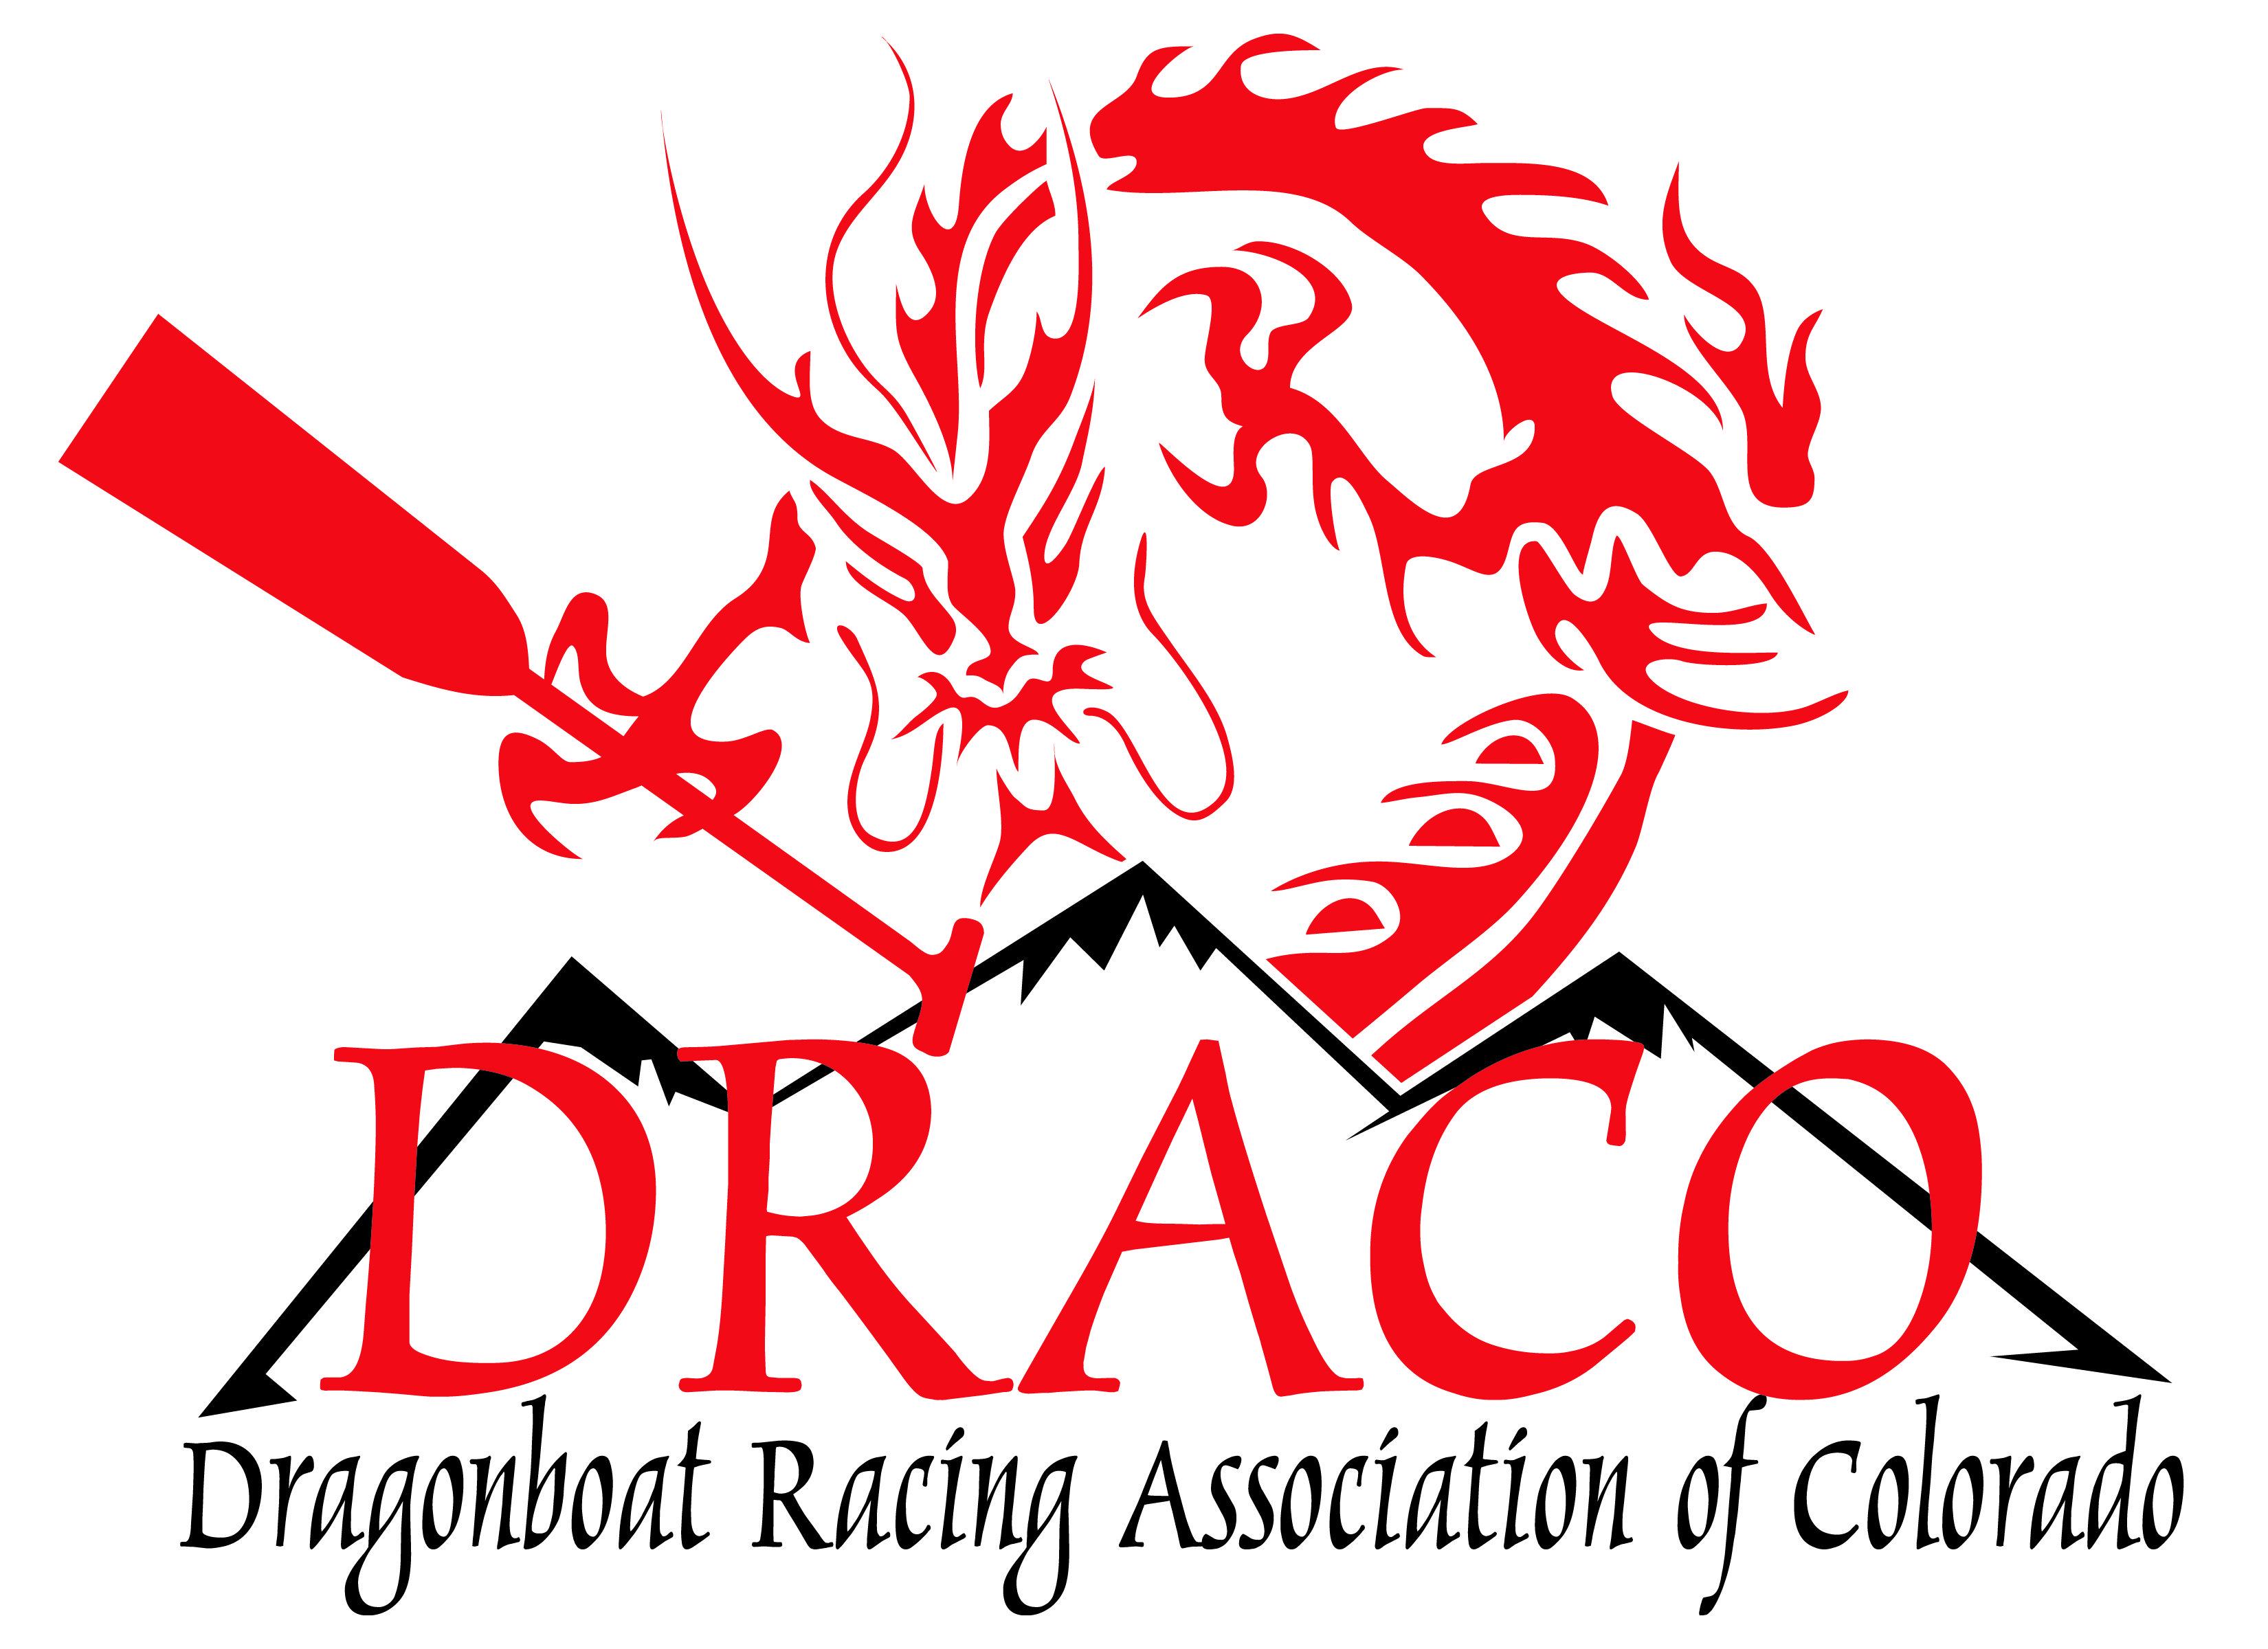 Dragonboat Racing Association of Colorado